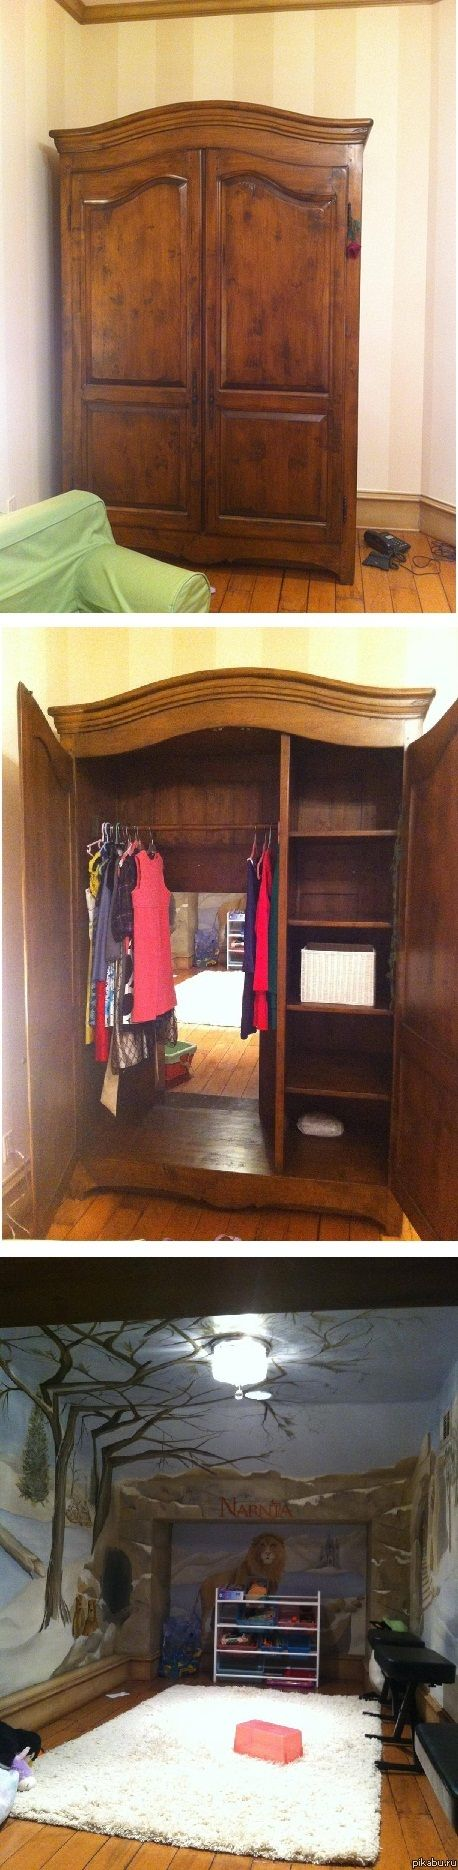 Narnia: Ideas, Plays Rooms, Wardrobes, Playrooms, House, Narnia, Hidden Rooms, Secret Rooms, Kids Rooms